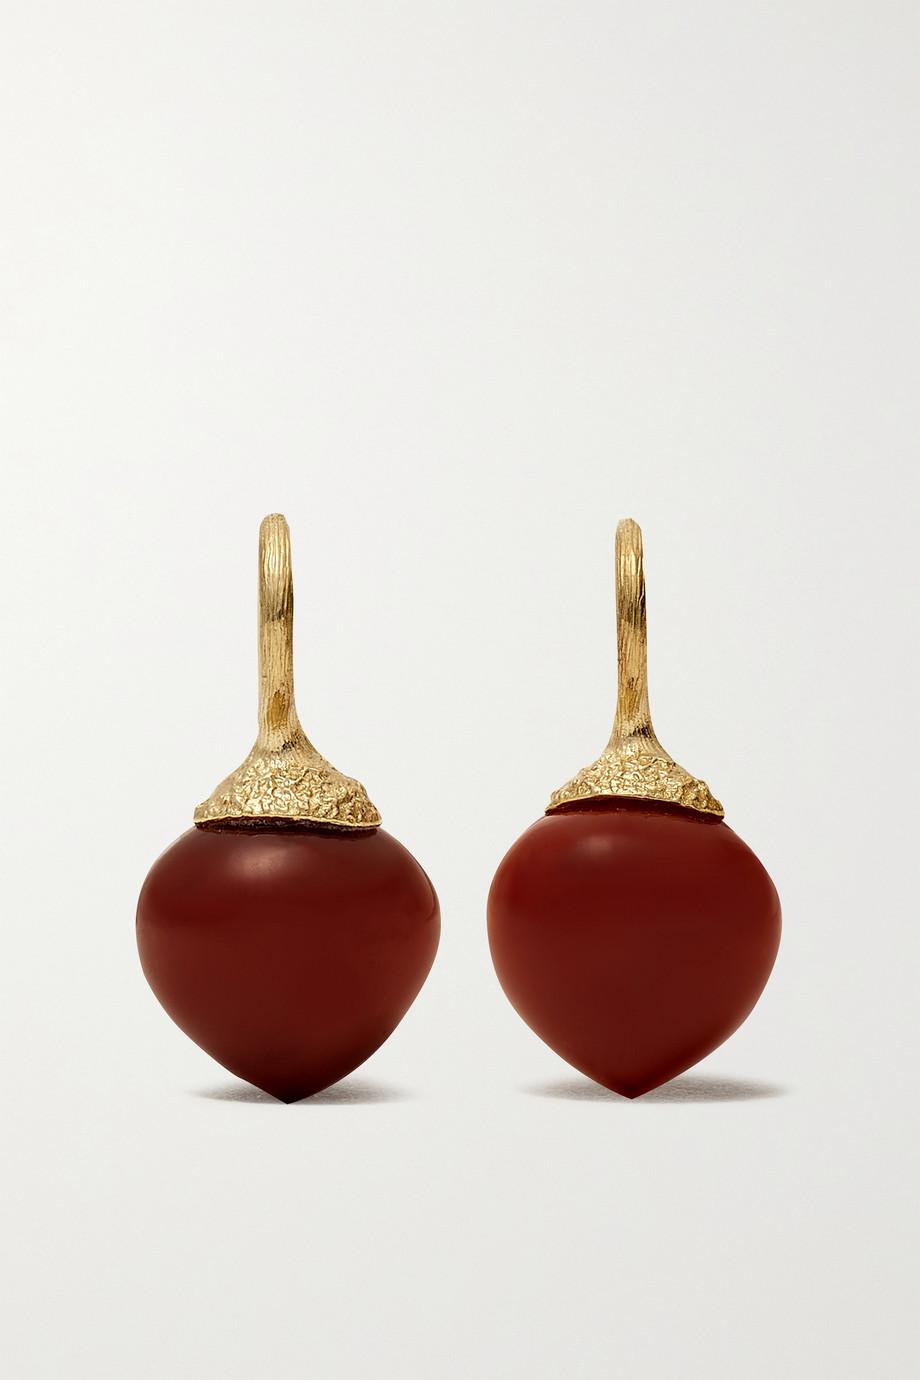 OLE LYNGGAARD COPENHAGEN Dew Drops Small Ohrringe aus 18 Karat Gold mit Karneolen